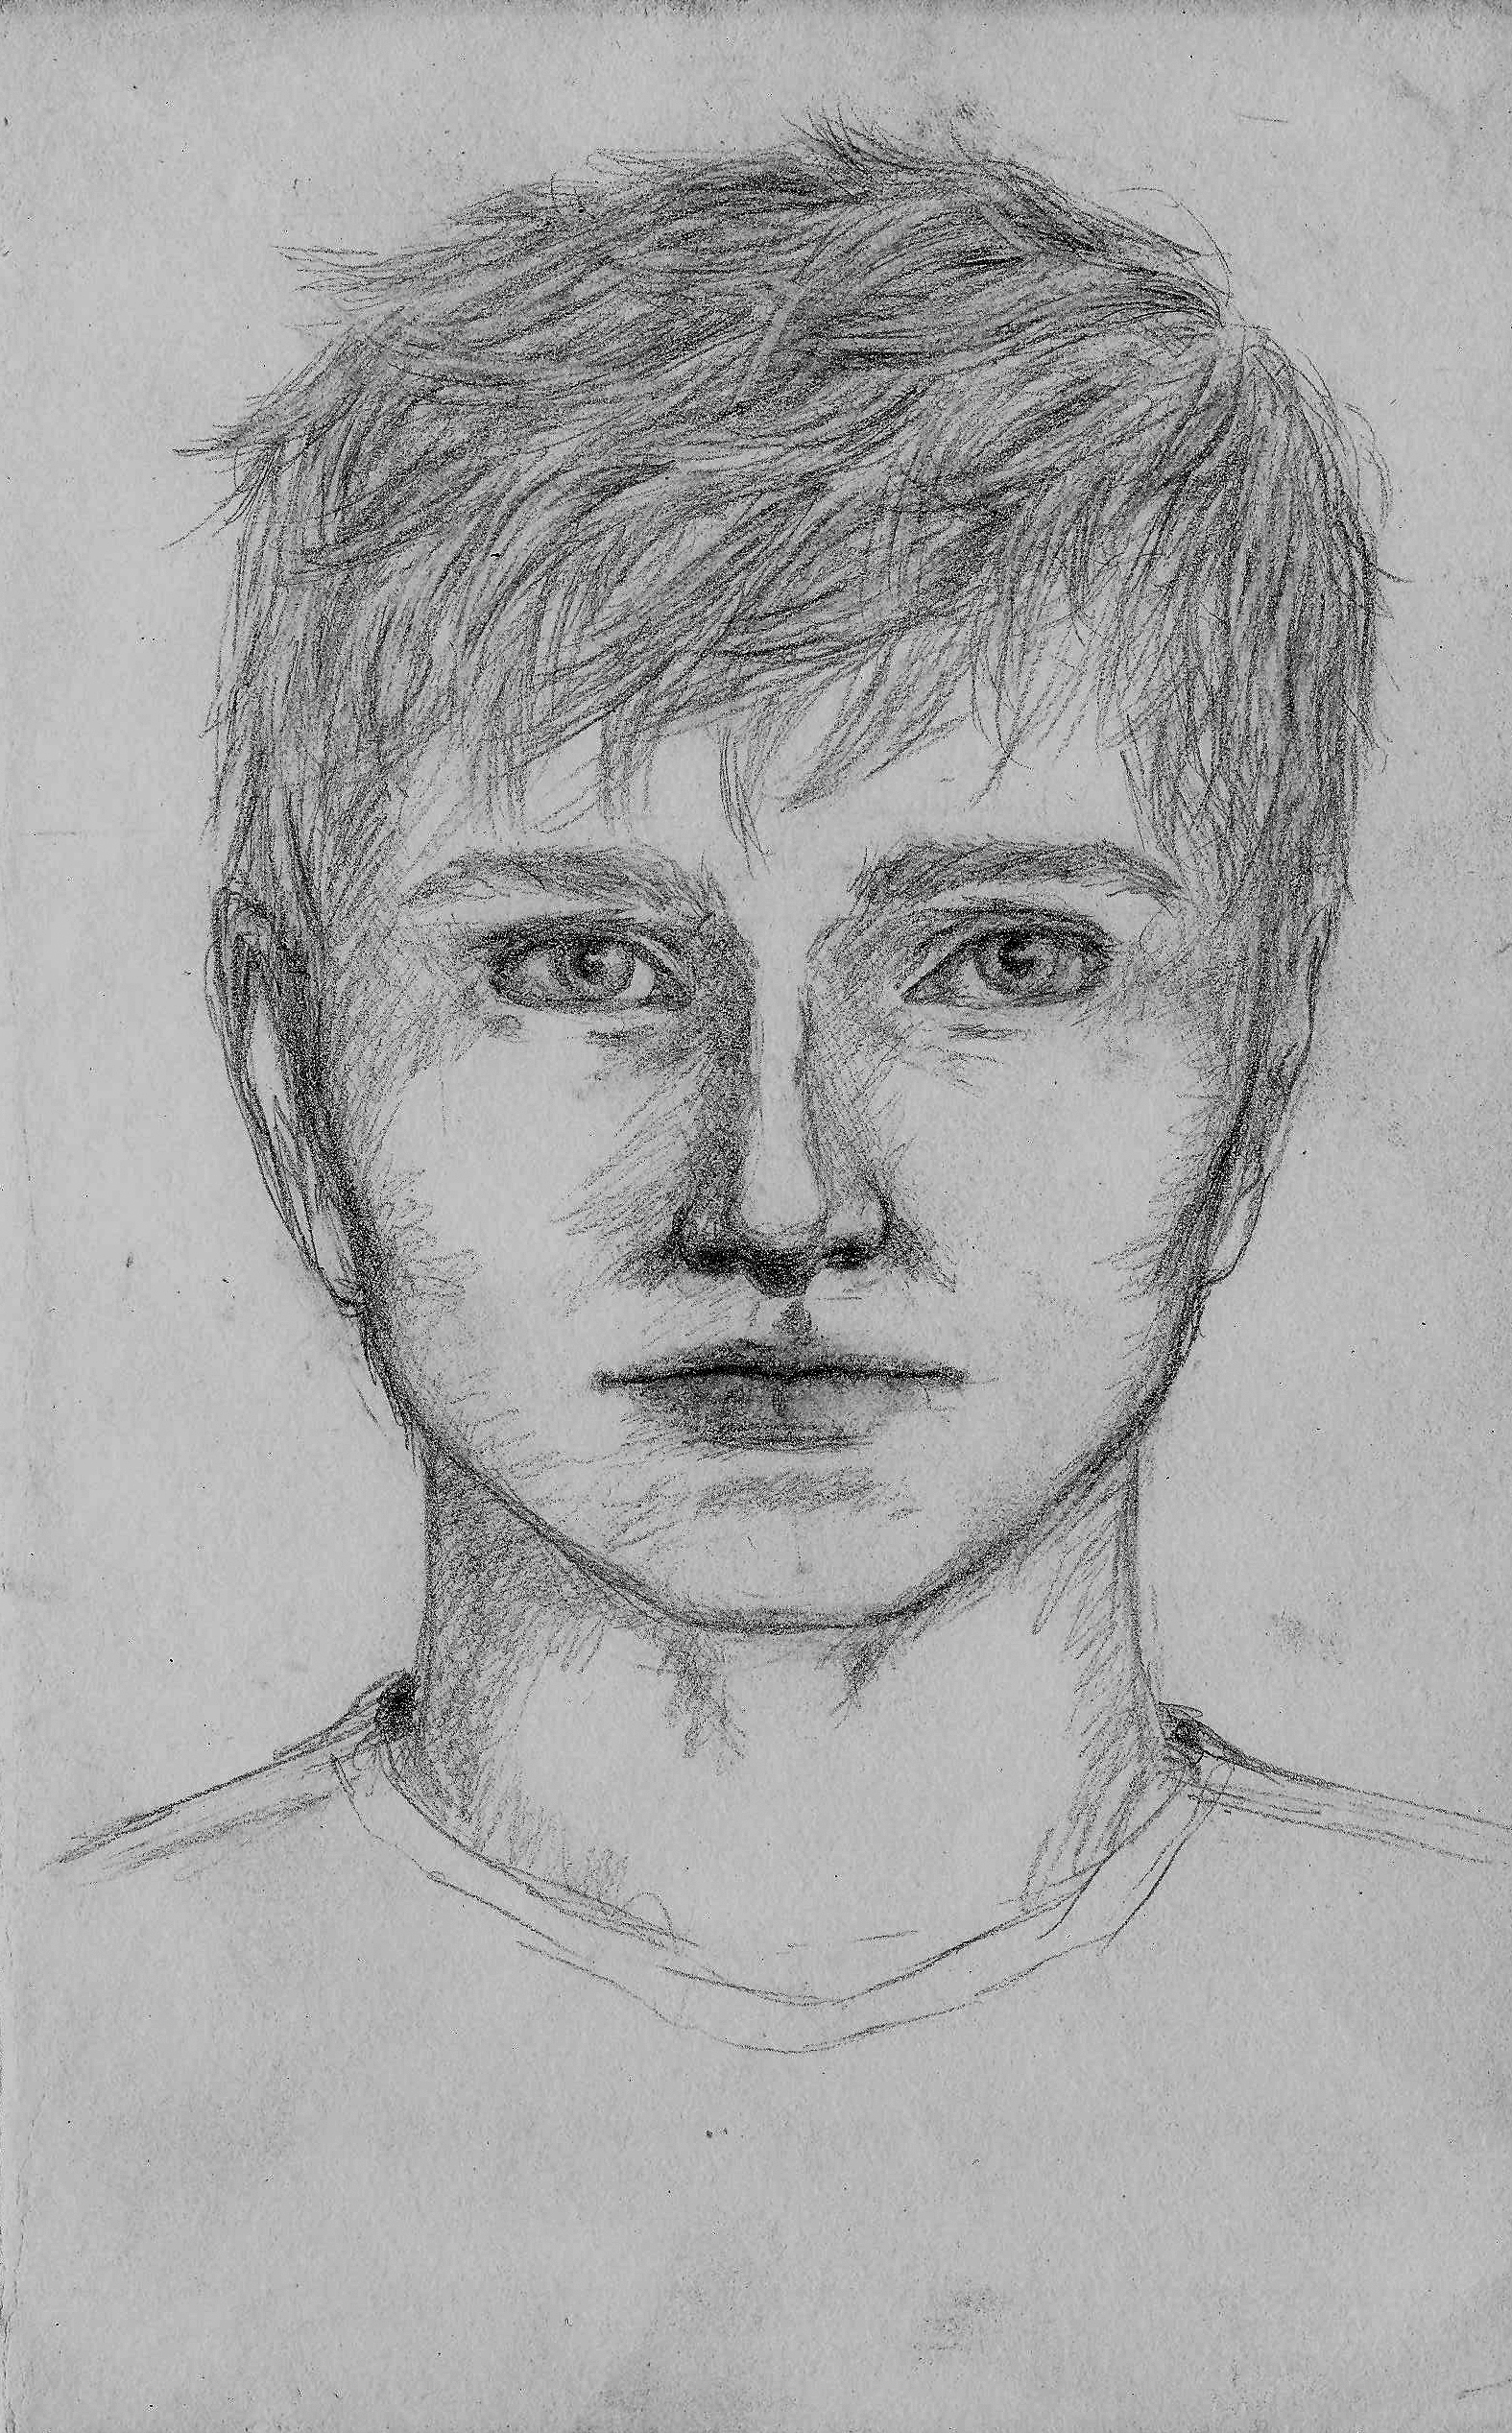 Gareth Sketch